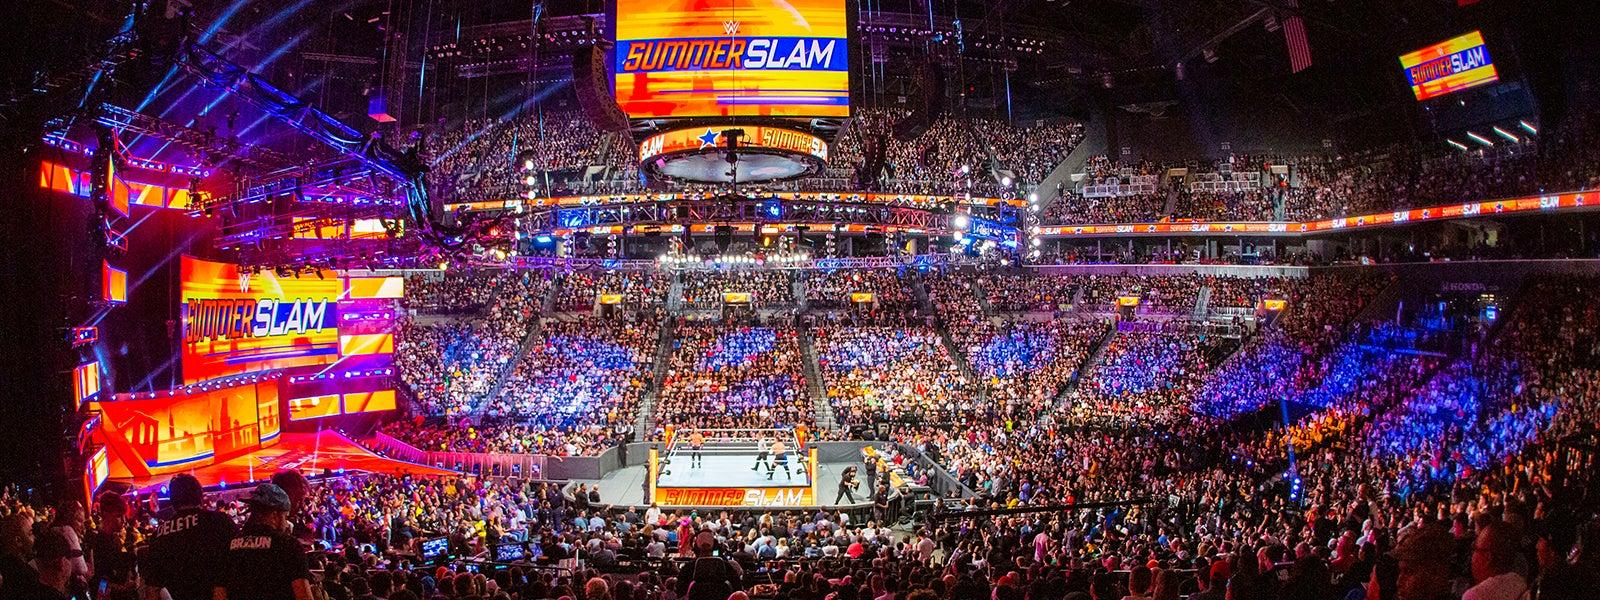 WWE Summerslam / Friday Night Smackdown